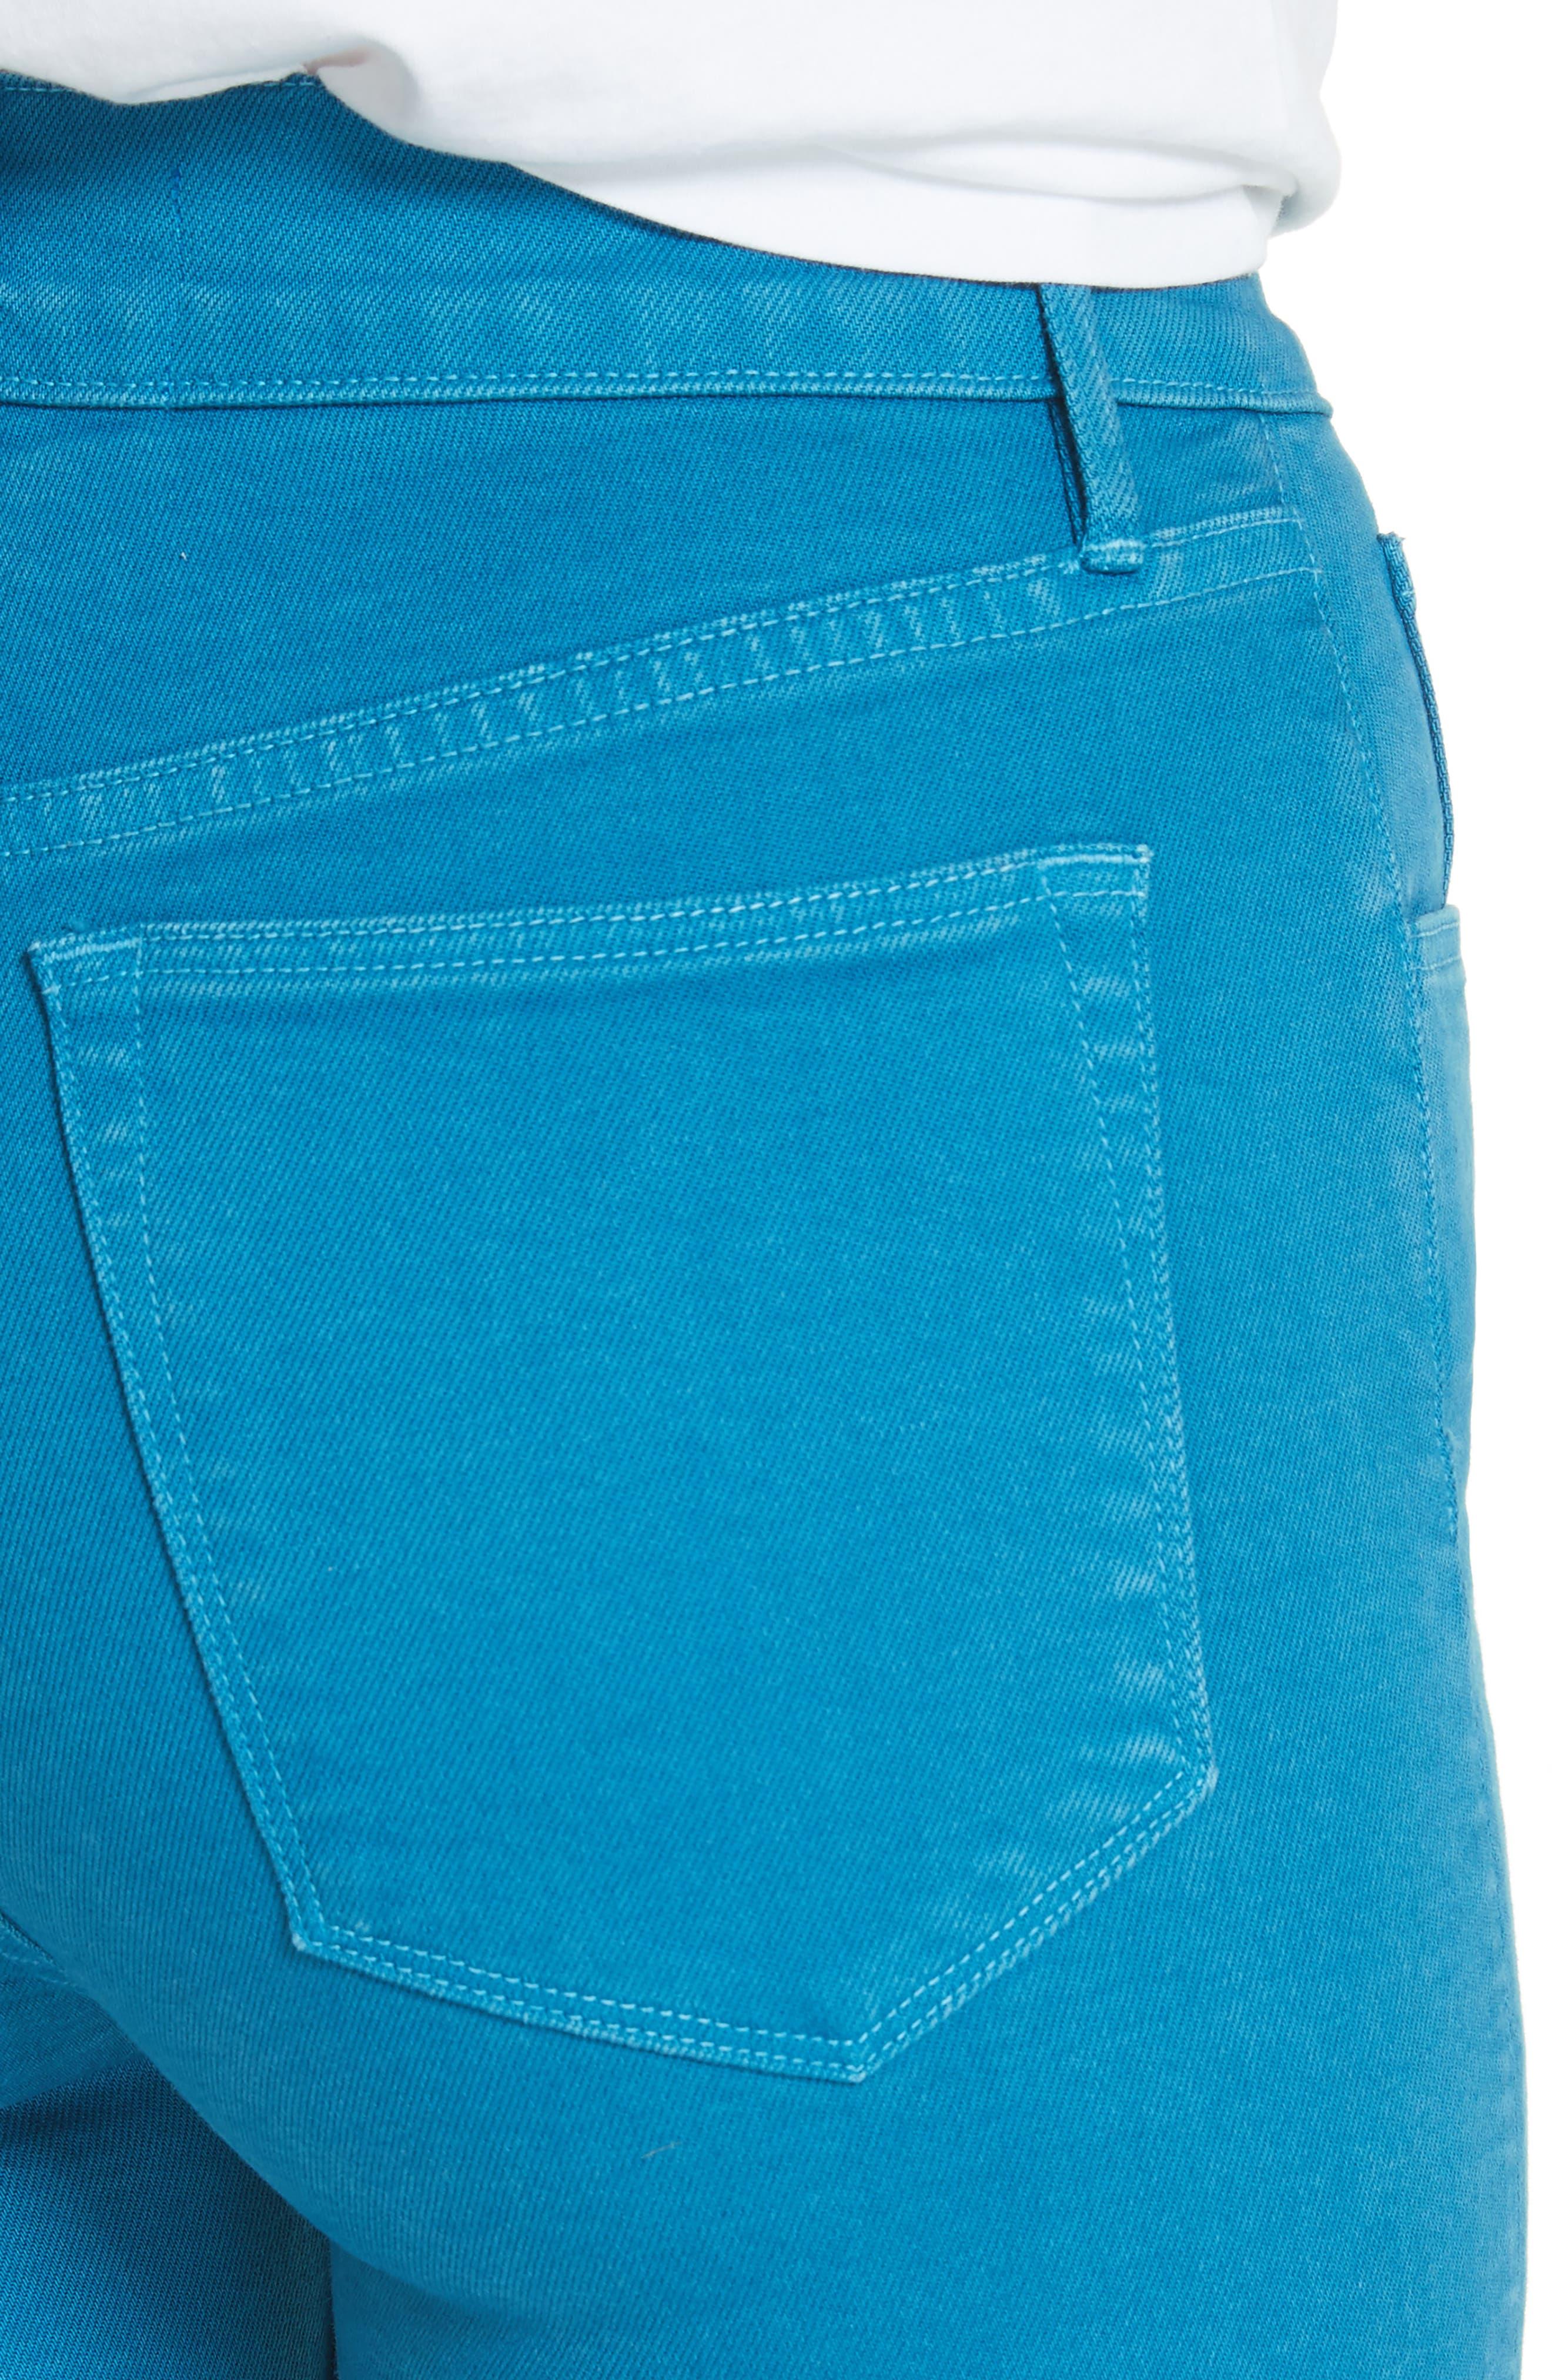 W4 Shelter Wide Leg Crop Jeans,                             Alternate thumbnail 4, color,                             Peacock Blue